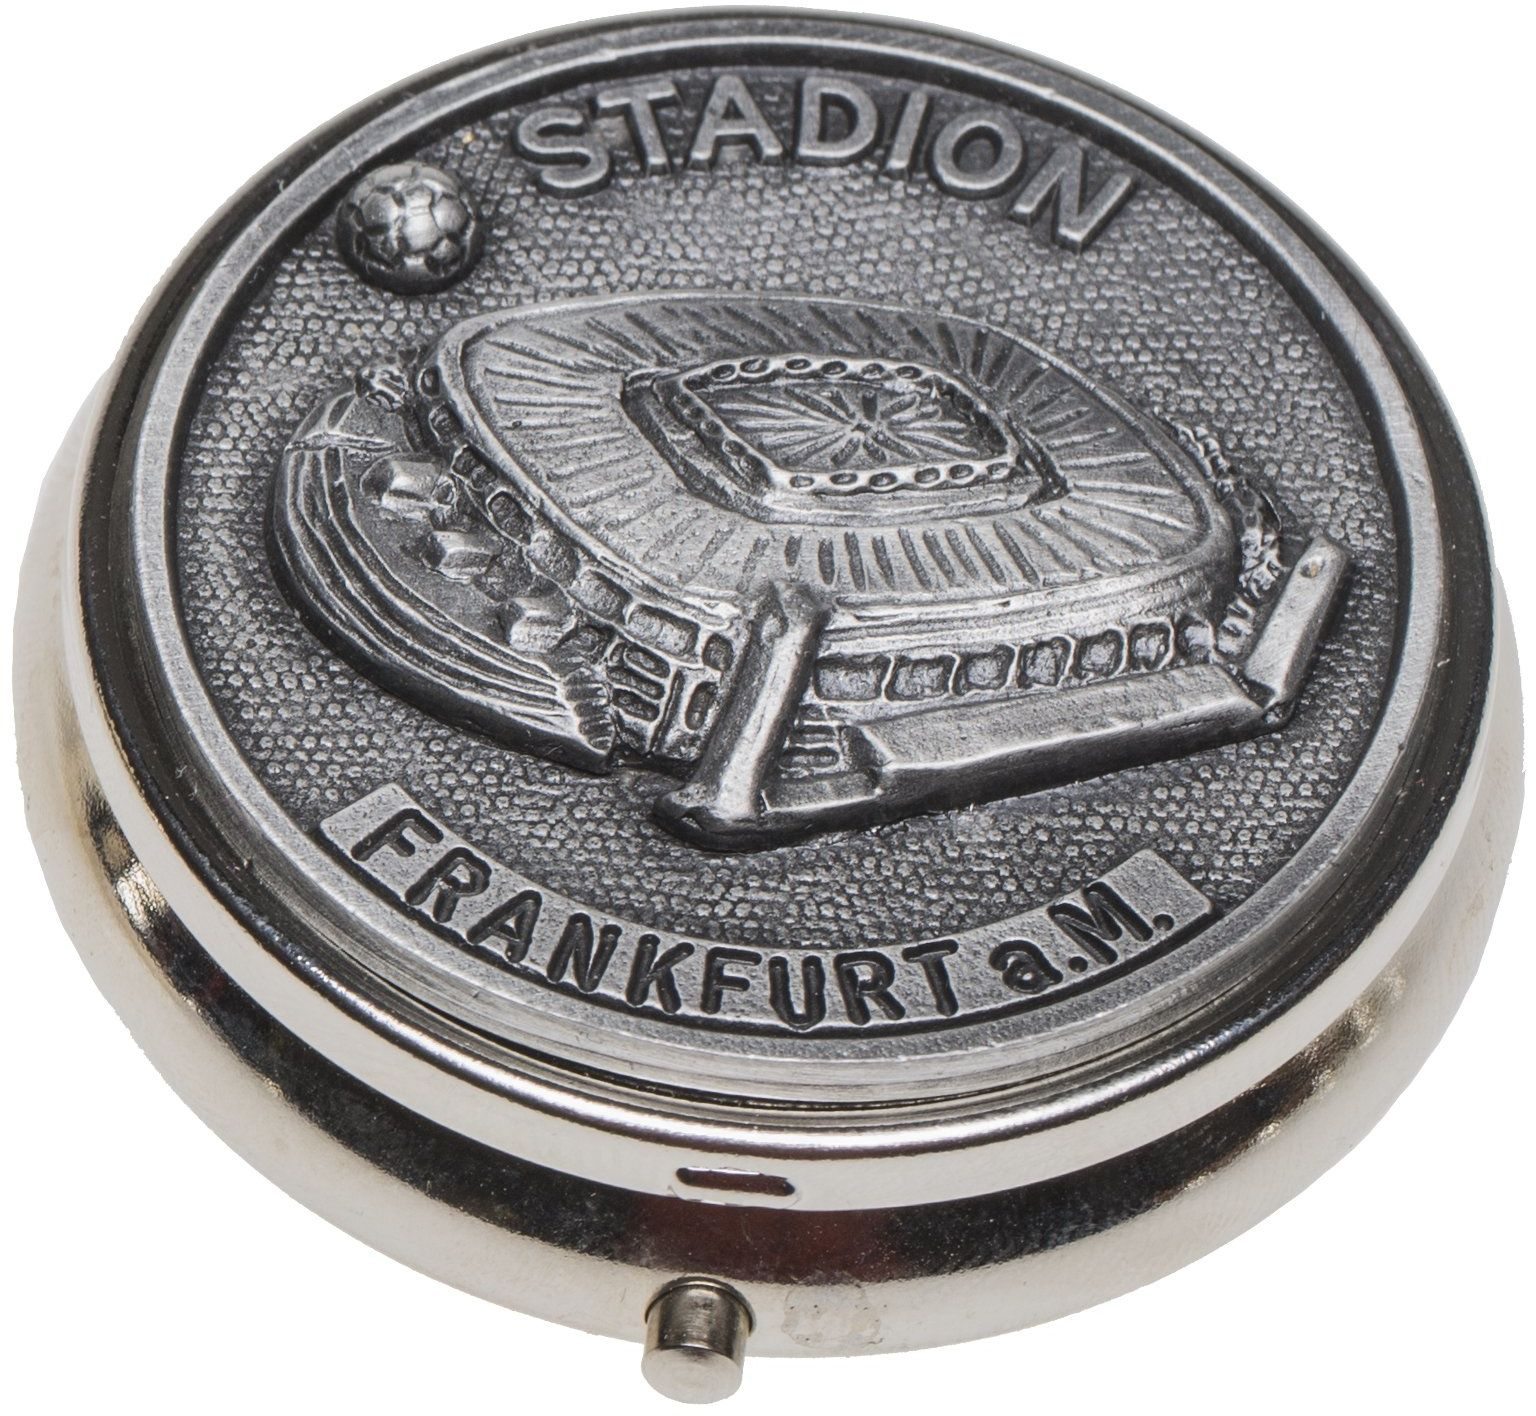 Schnabel-Schmuck Frankfurt popielniczka cyna stadion piłkarski